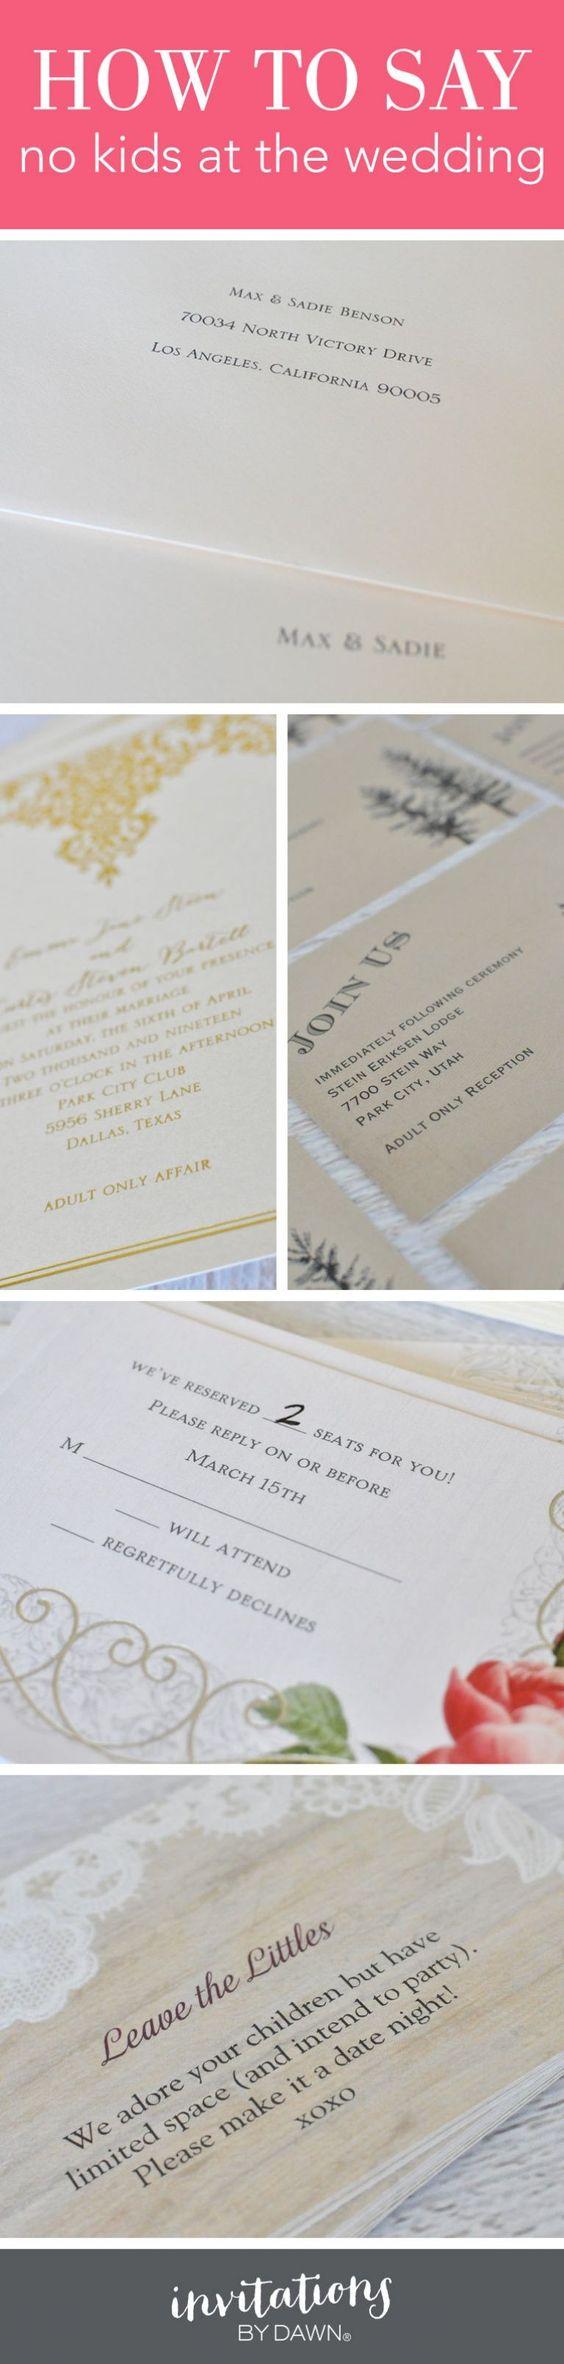 reply to wedding invitation m%0A Min Blue Ocean Ombre Wedding Hotel Accomodation   Cm X    Cm Invitation  Card   Caribbean Blue Ocean Pastel Ombre Dandelion Wedding   Pinterest    Zazzle